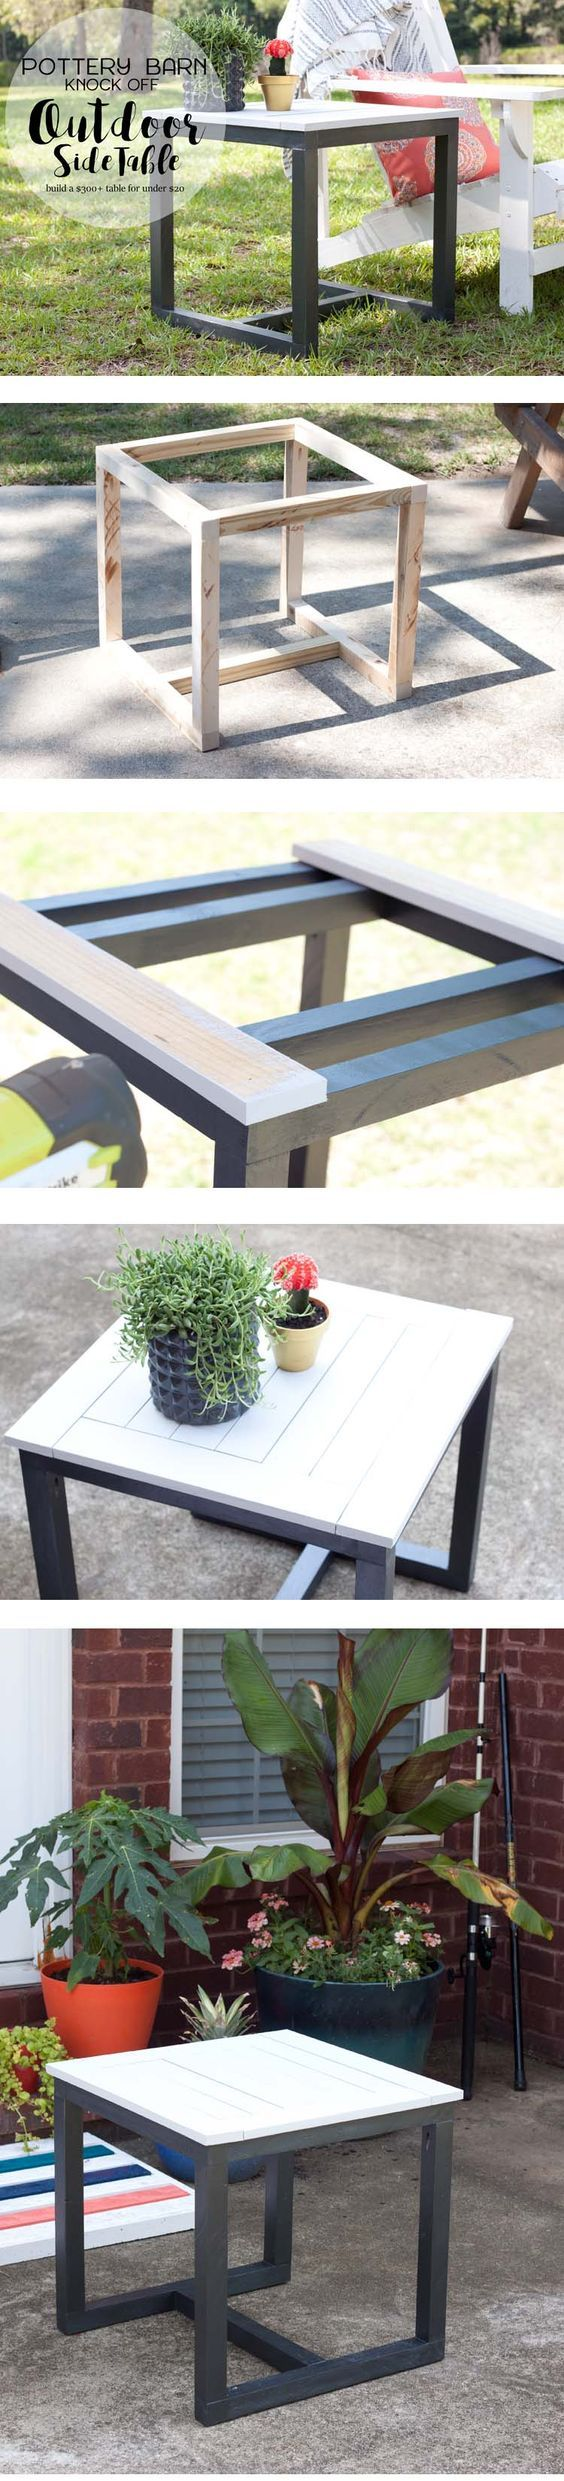 Diy Outdoor Furniture Best 25 Homemade Outdoor Furniture Ideas On Pinterest Outdoor